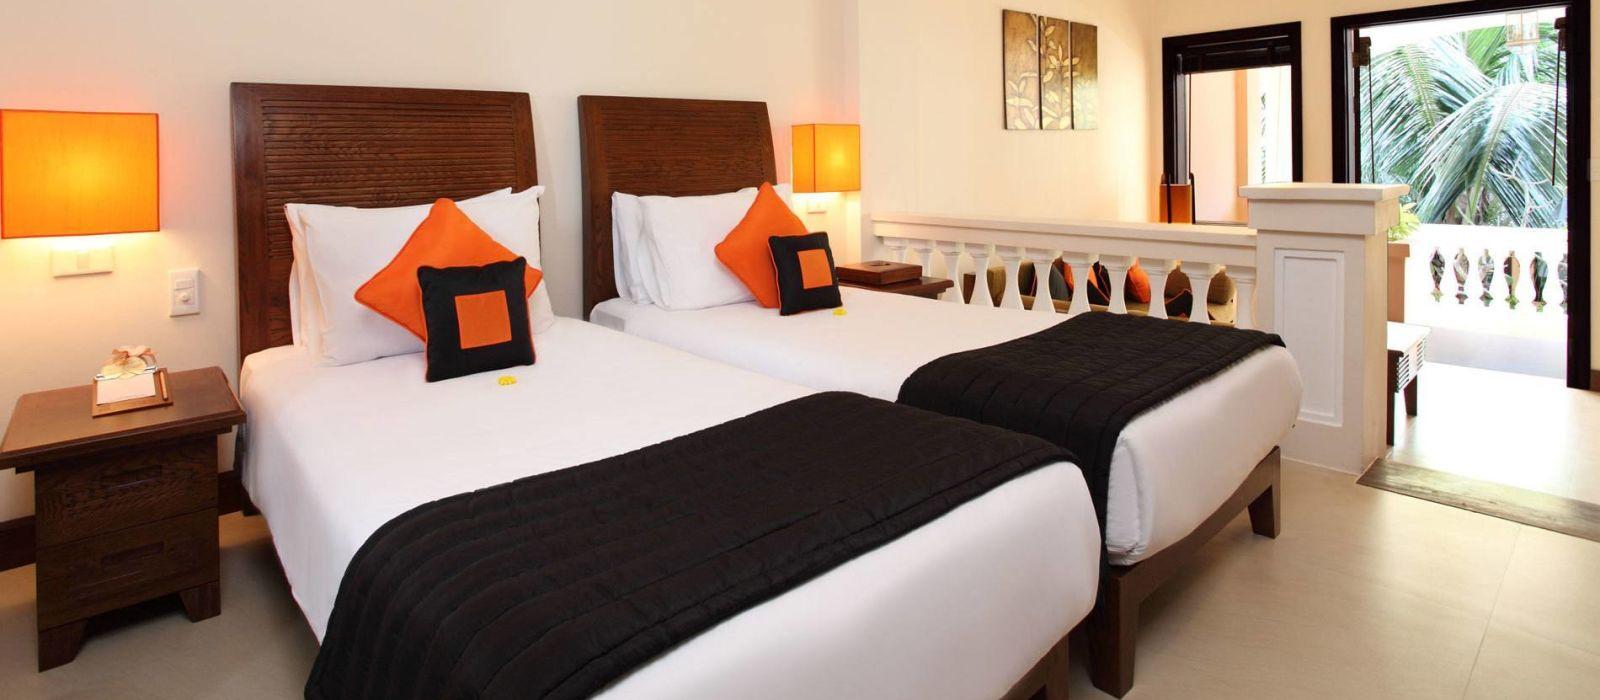 Hotel Anantara Hoi An Resort Vietnam